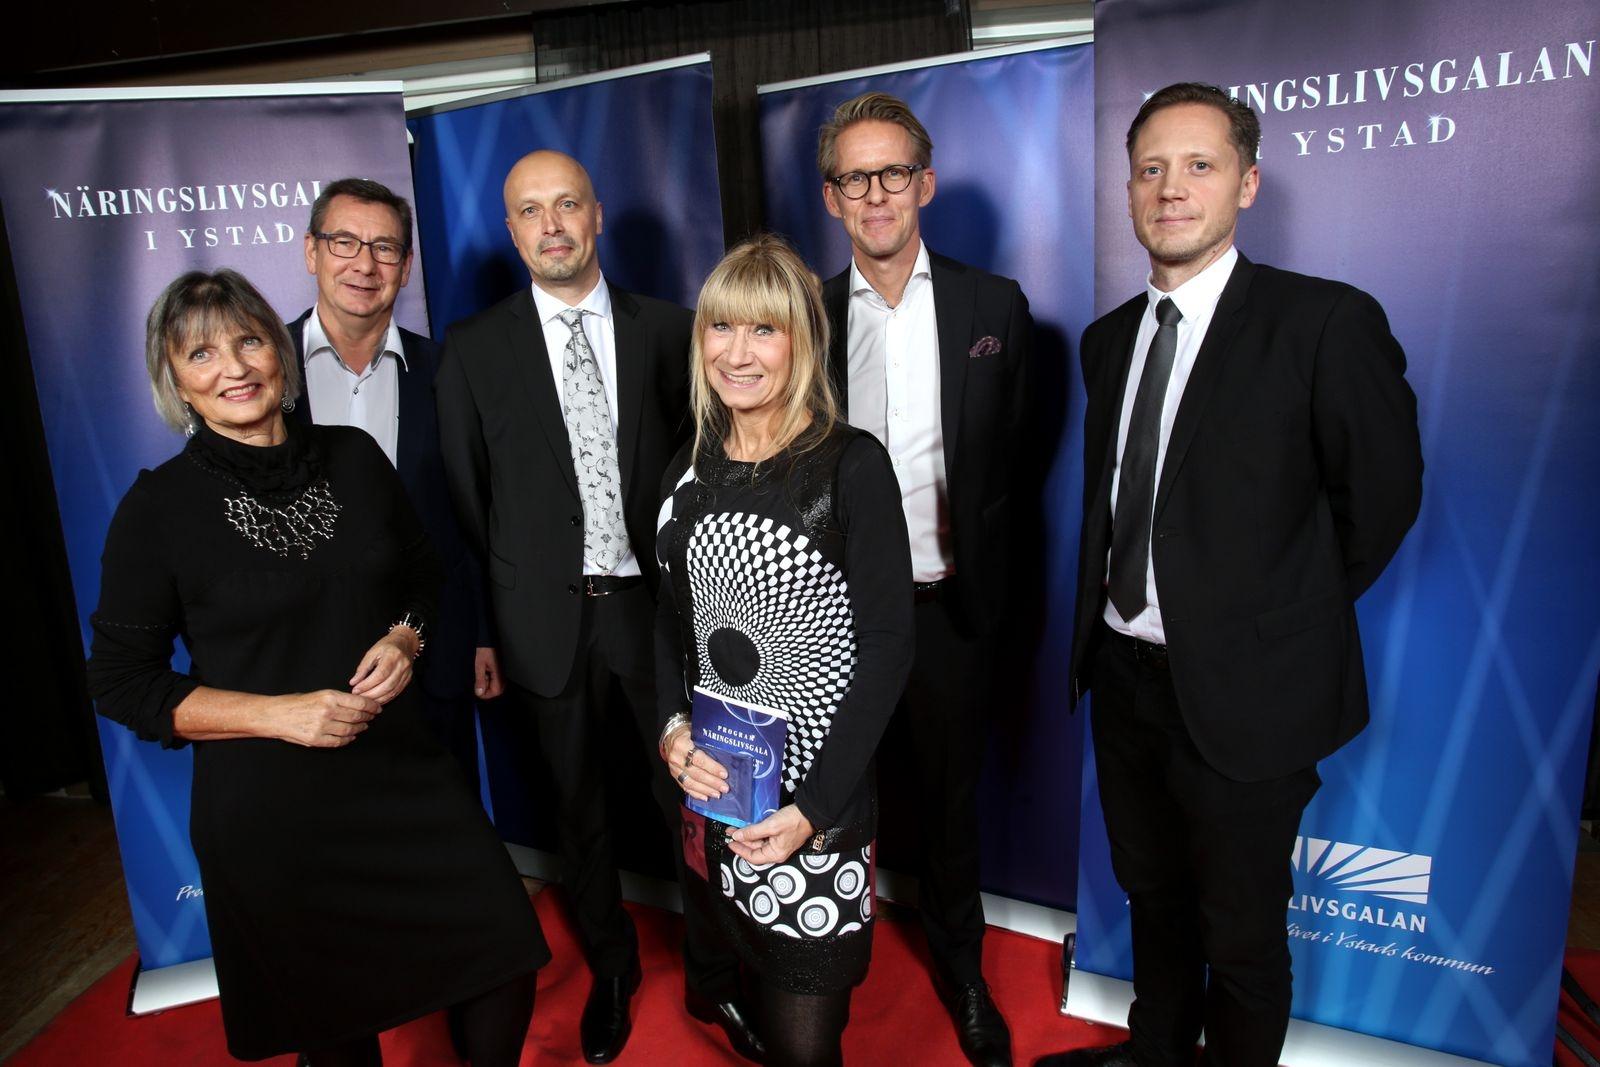 Kent Sandberg, Fredrik Paulsson, Ulla Andersson, Marie Lundh, Johan Fjelkner och Torbjörn Helldén, Sparbanken Skåne